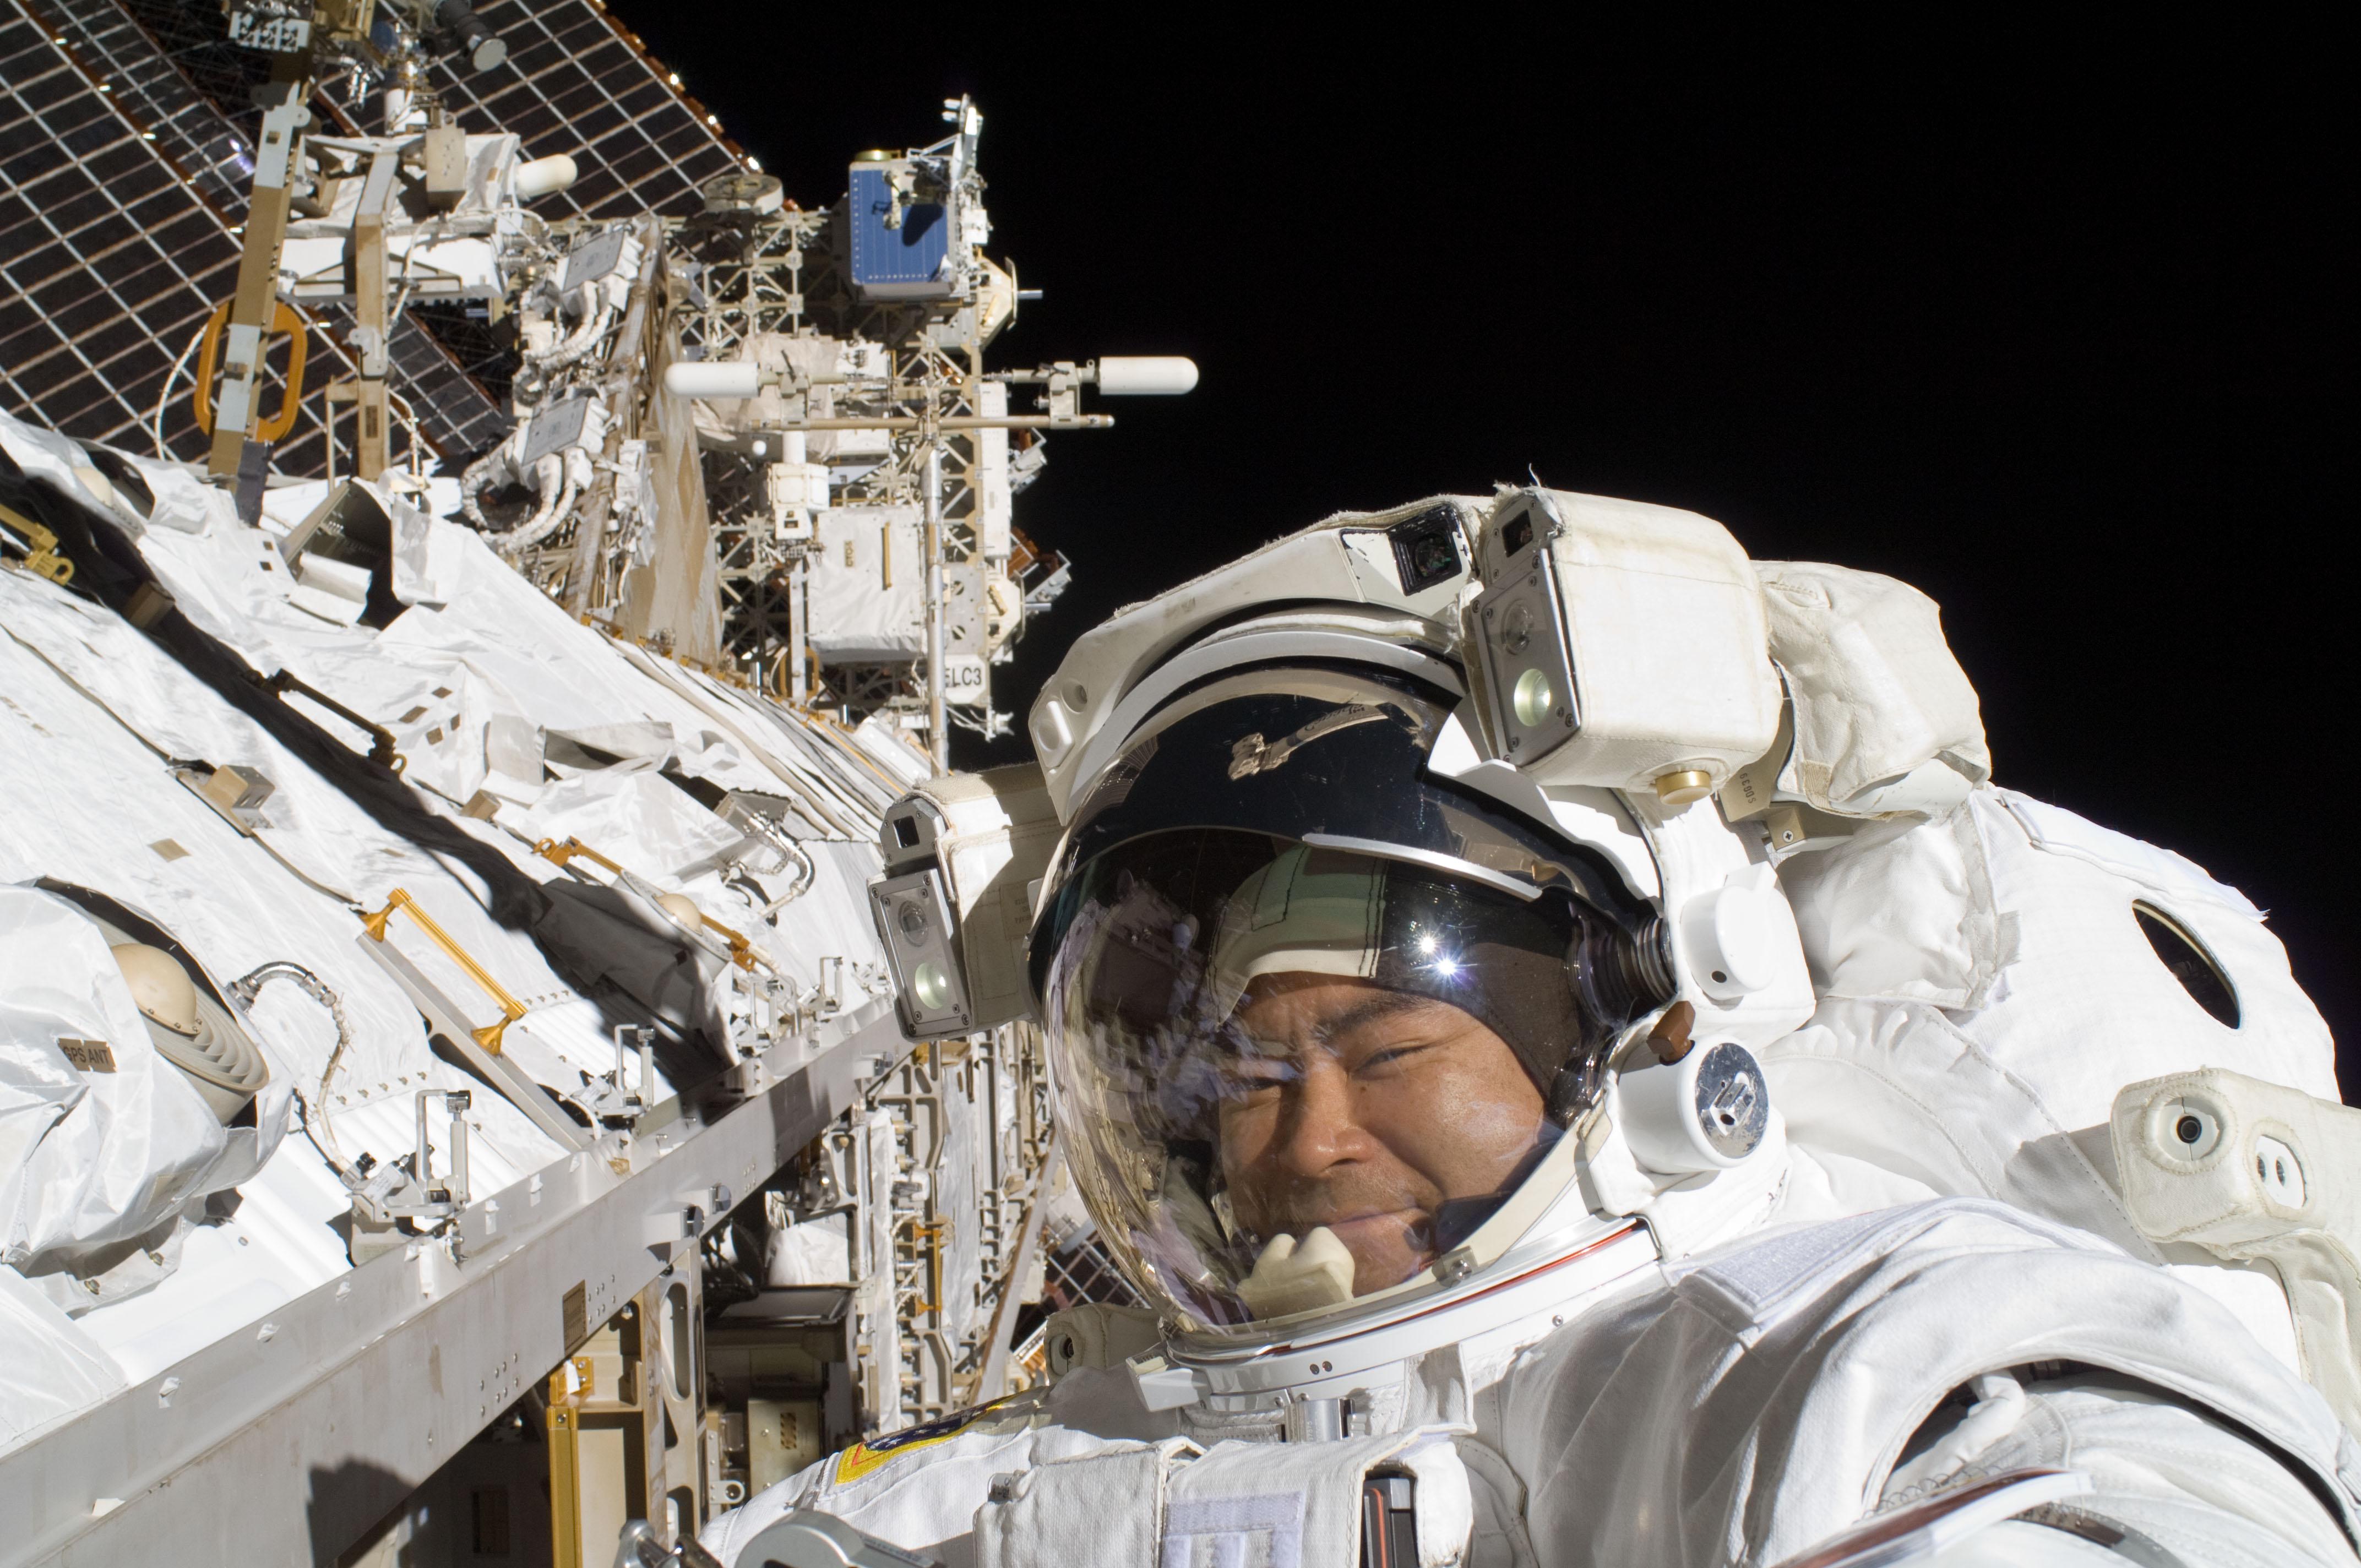 Astronaut Hoshide on ISS Spacewalk